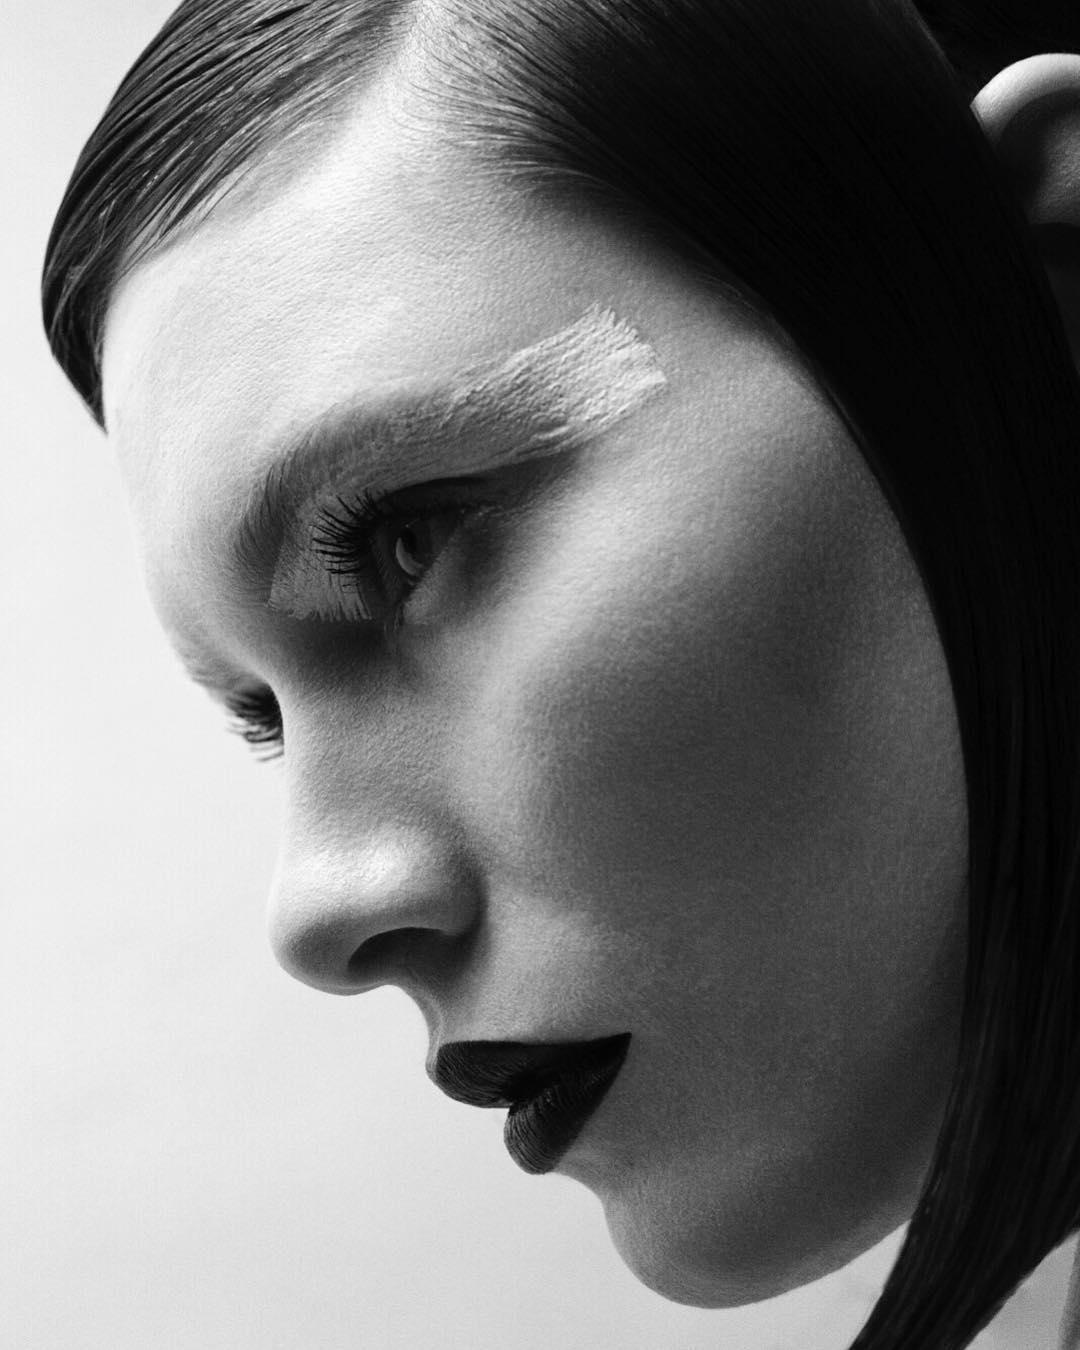 beautiful_black_and_white_portrait_photography_28.jpg